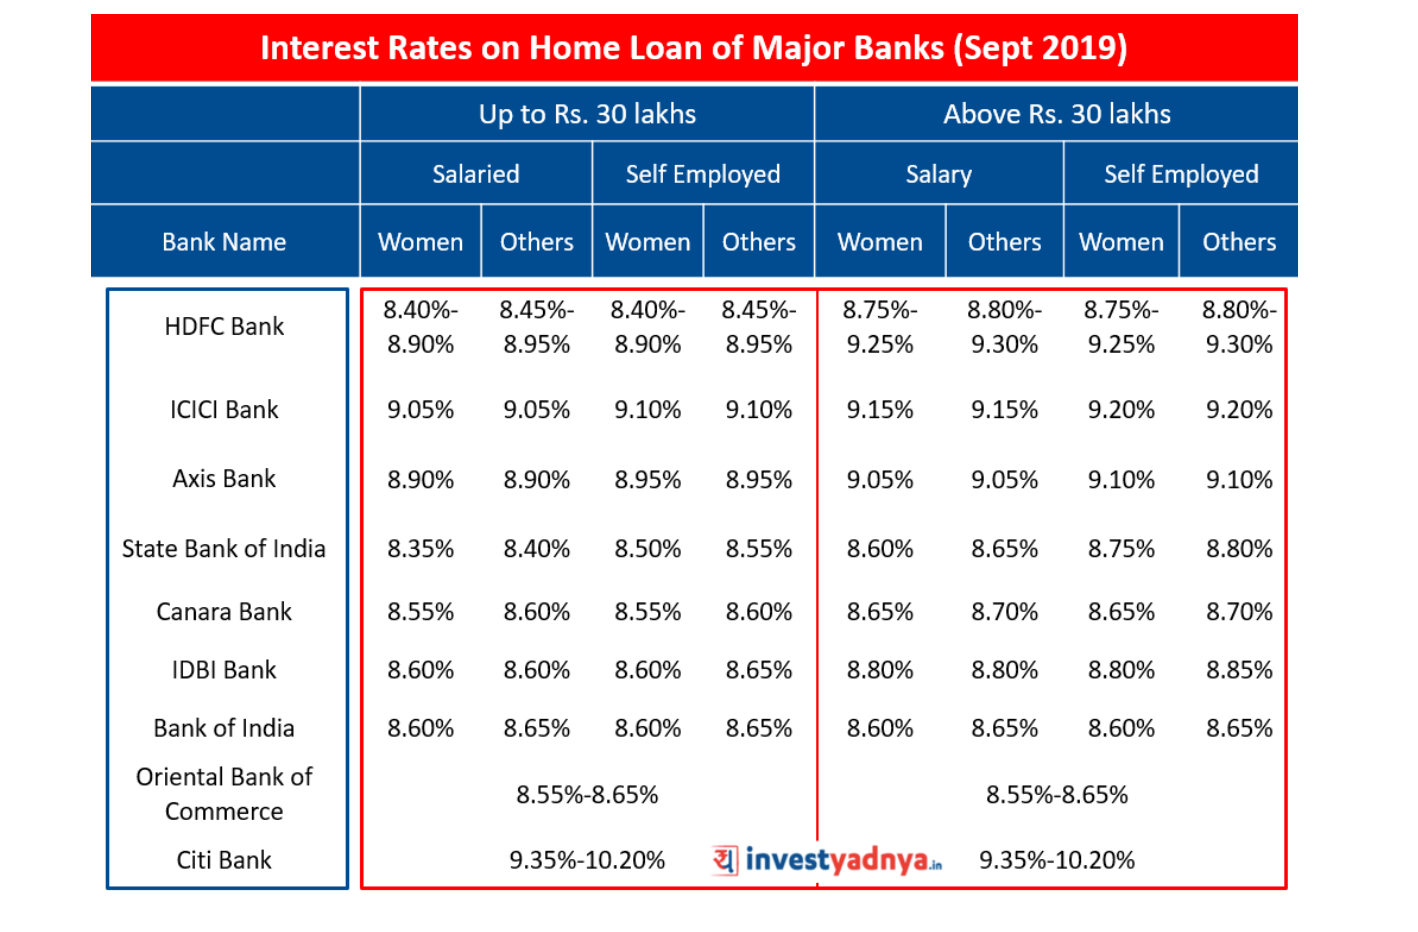 Interest Rates on Home Loan of Major Banks (Sept 2019)